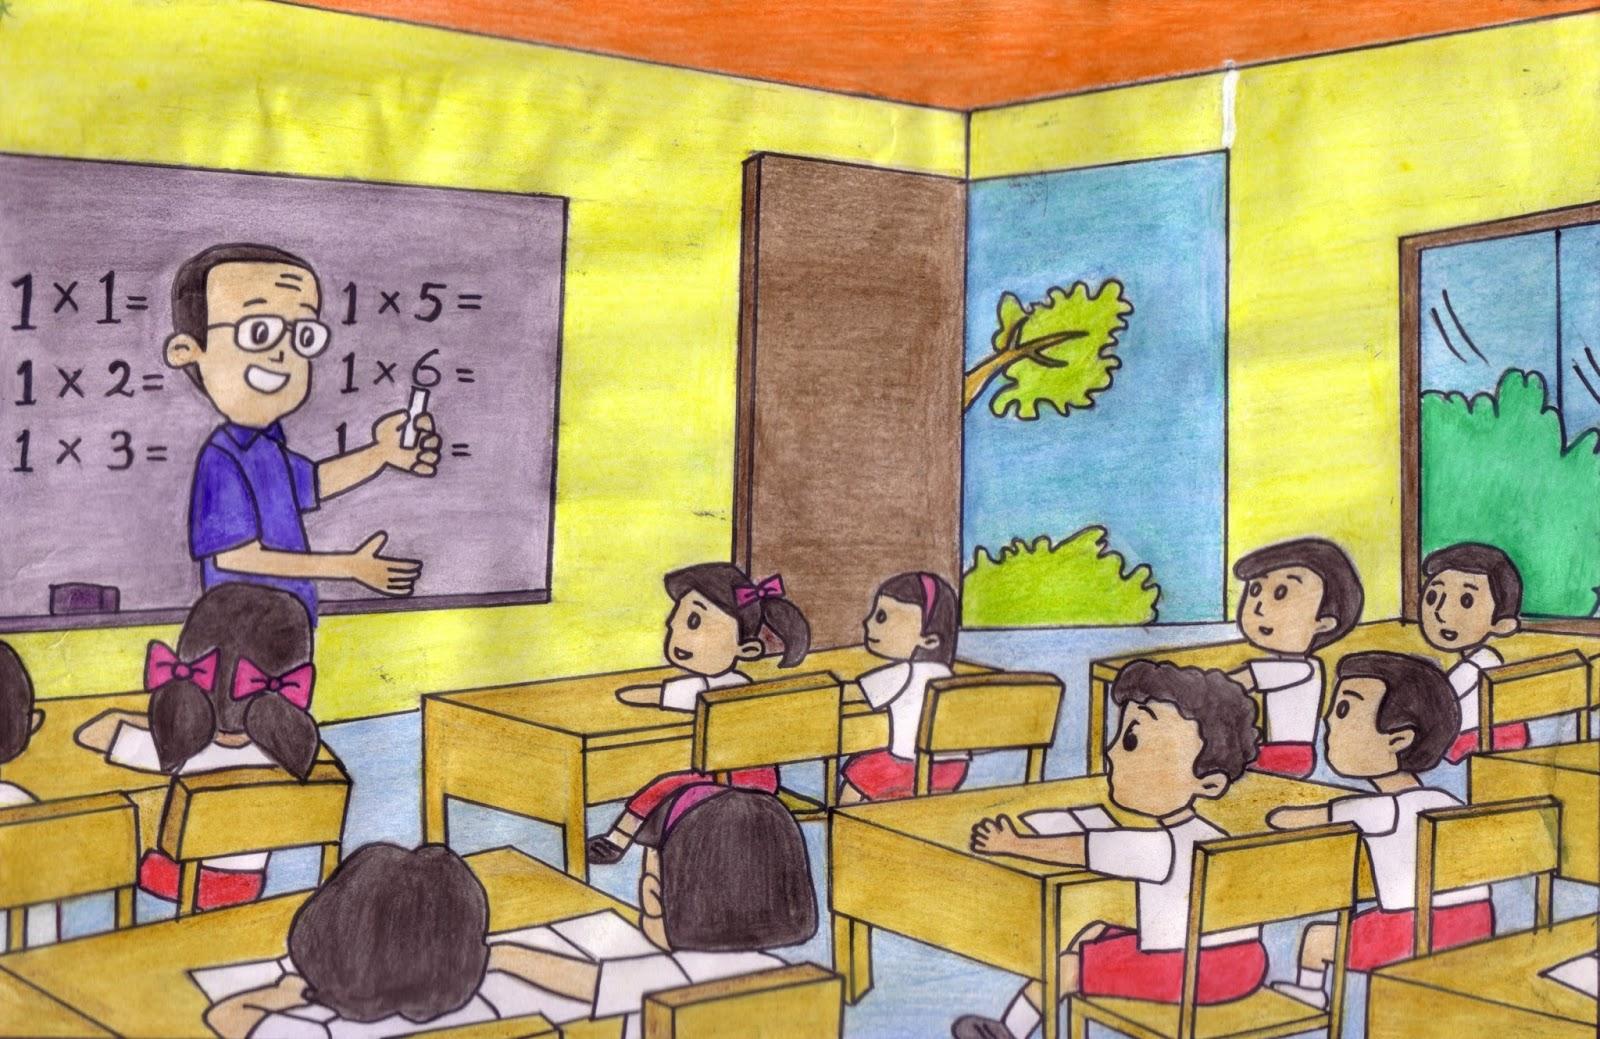 Top Gambar Kartun Yg Sedang Belajar